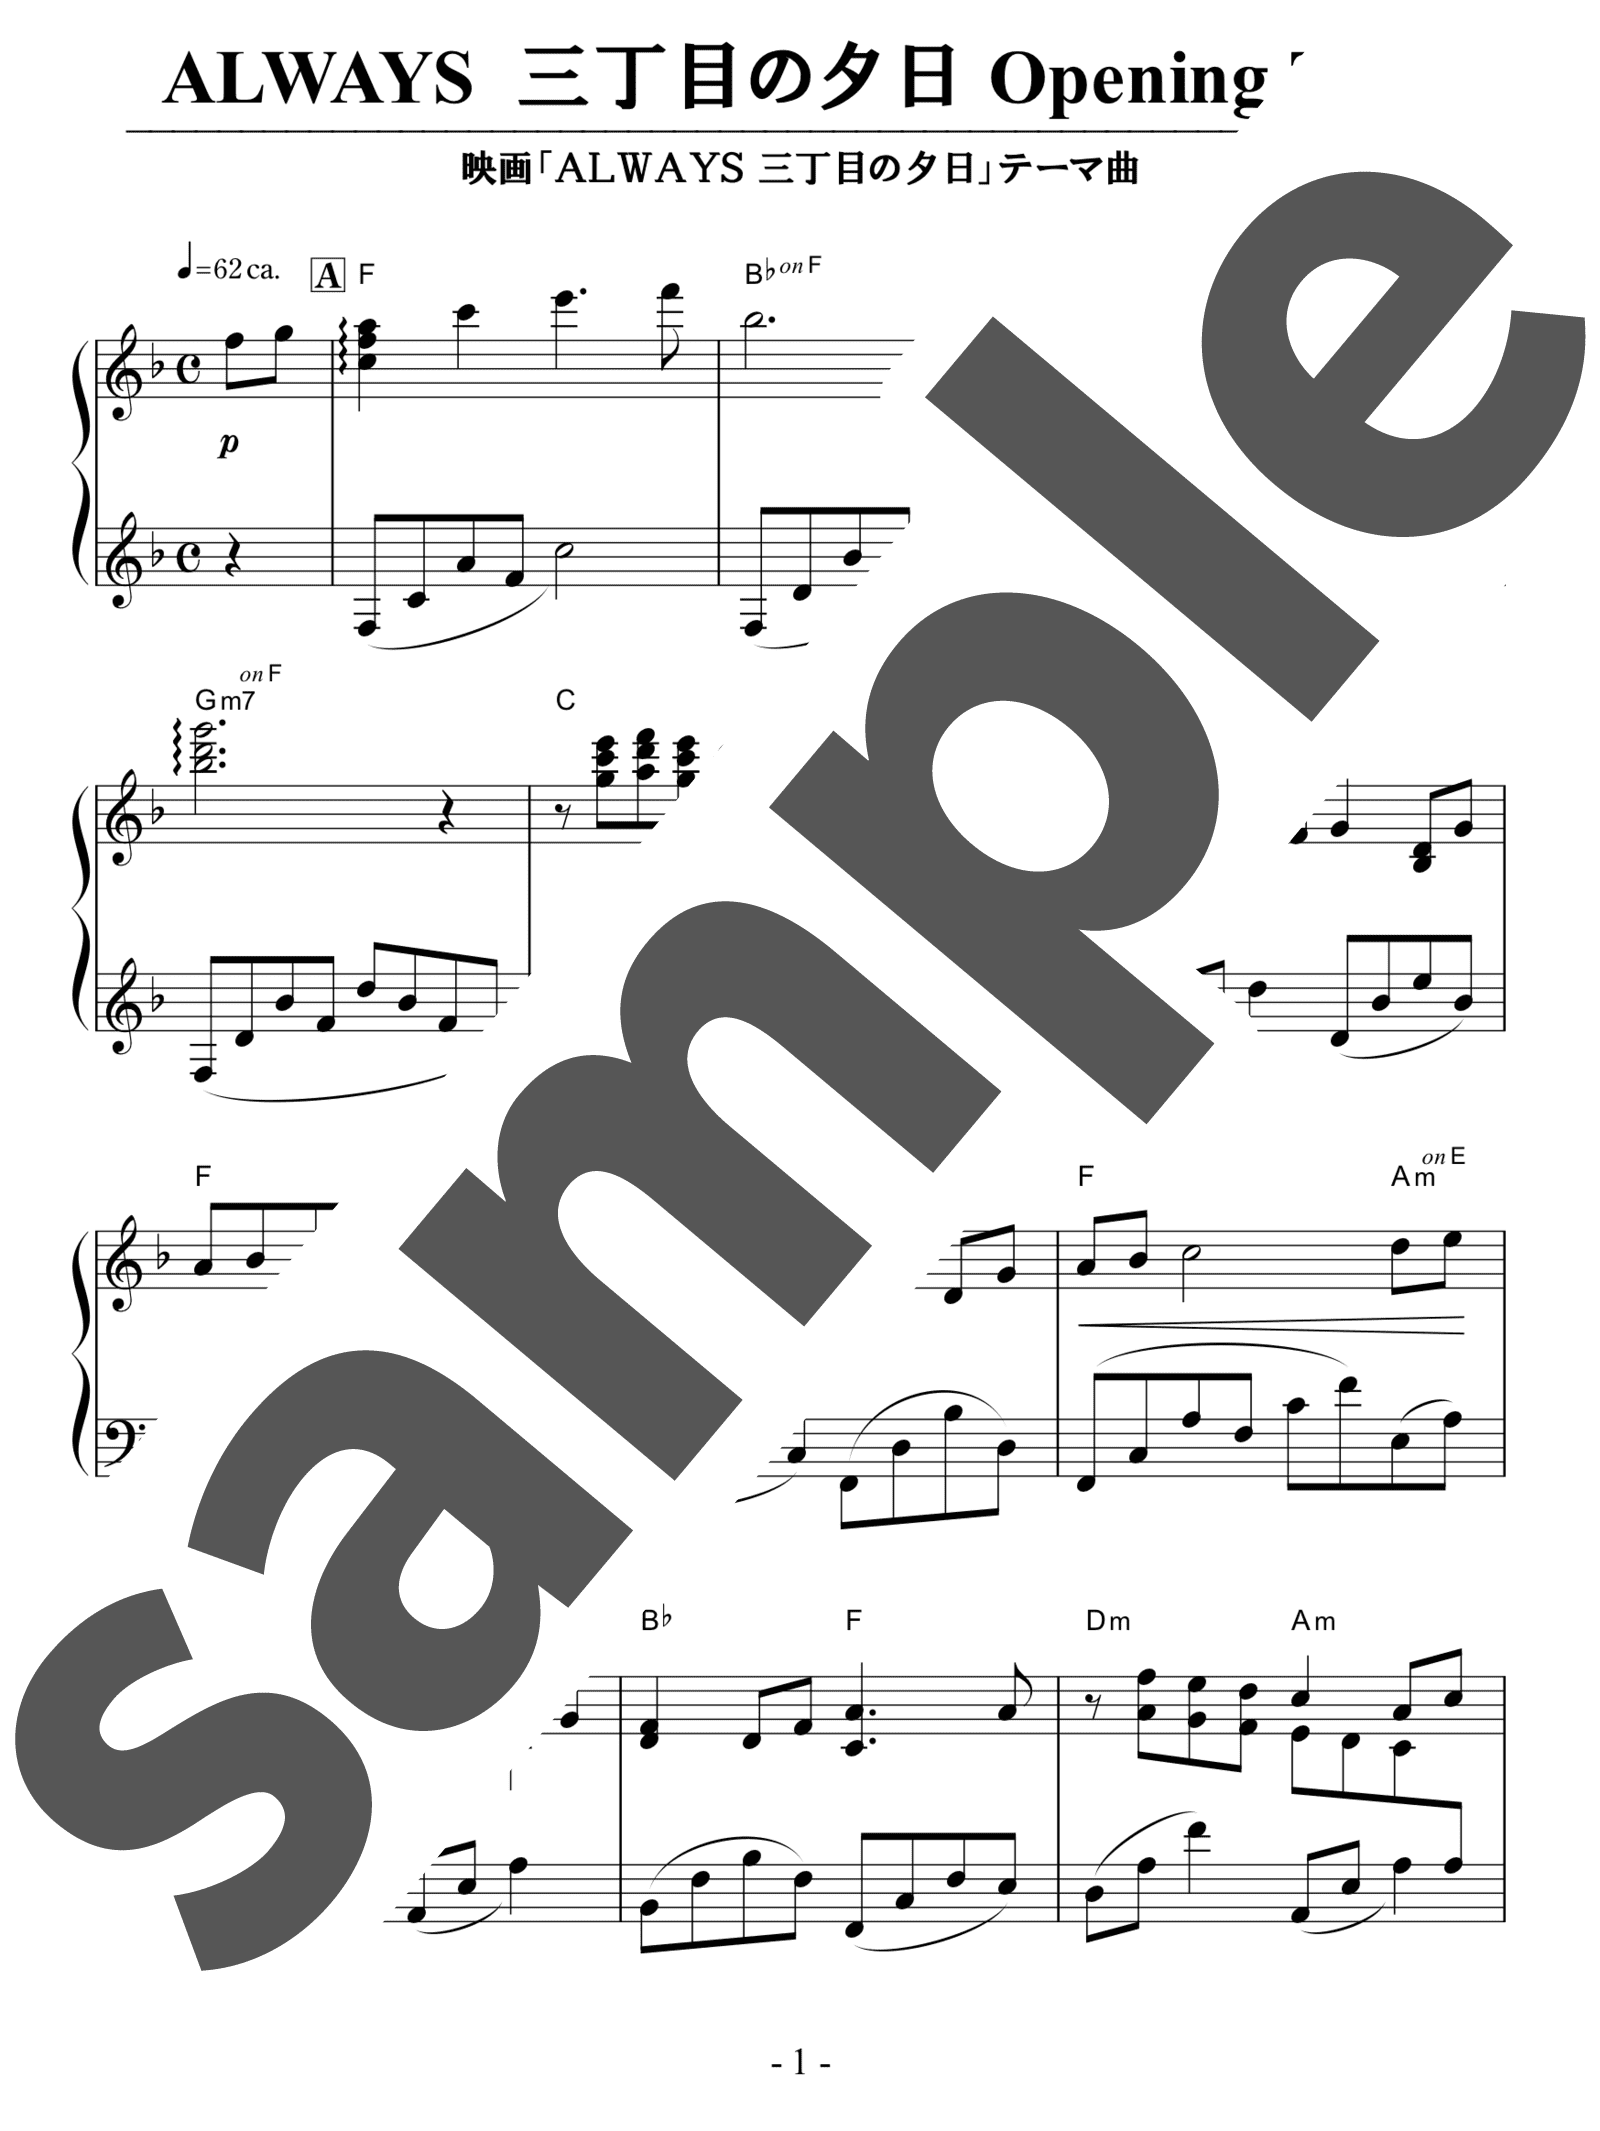 「ALWAYS 三丁目の夕日 Opening Title」のサンプル楽譜